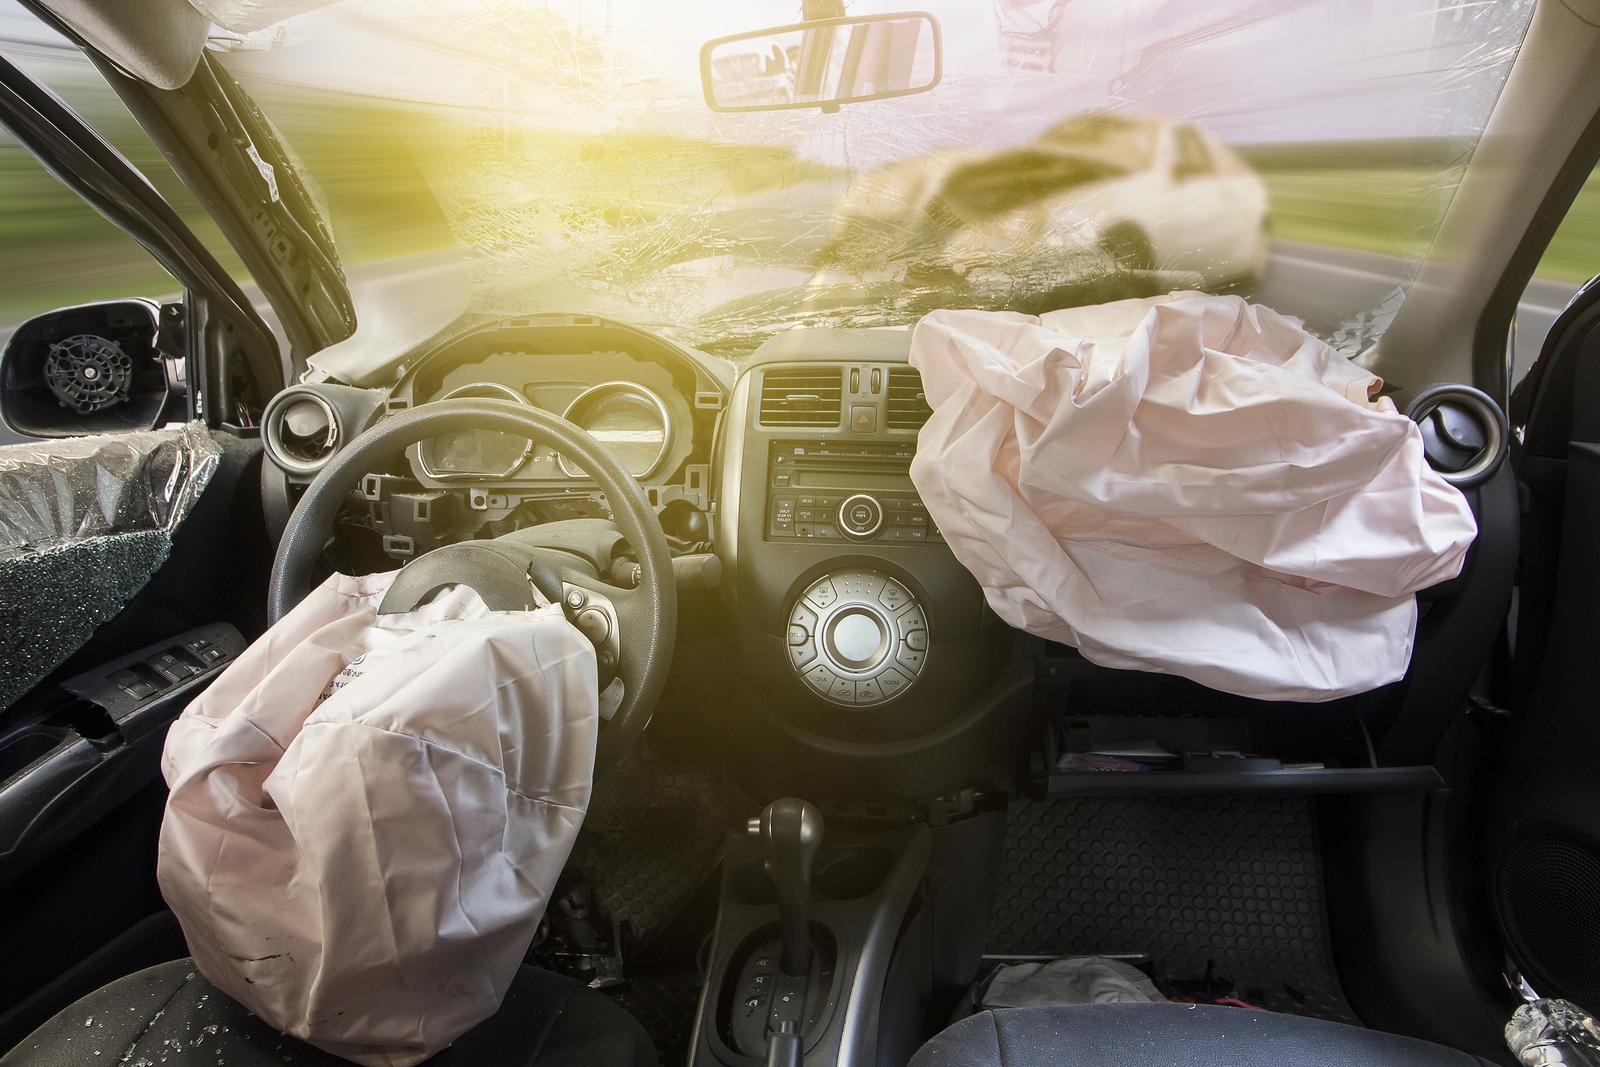 accidentes de tránsito en argentina 2019